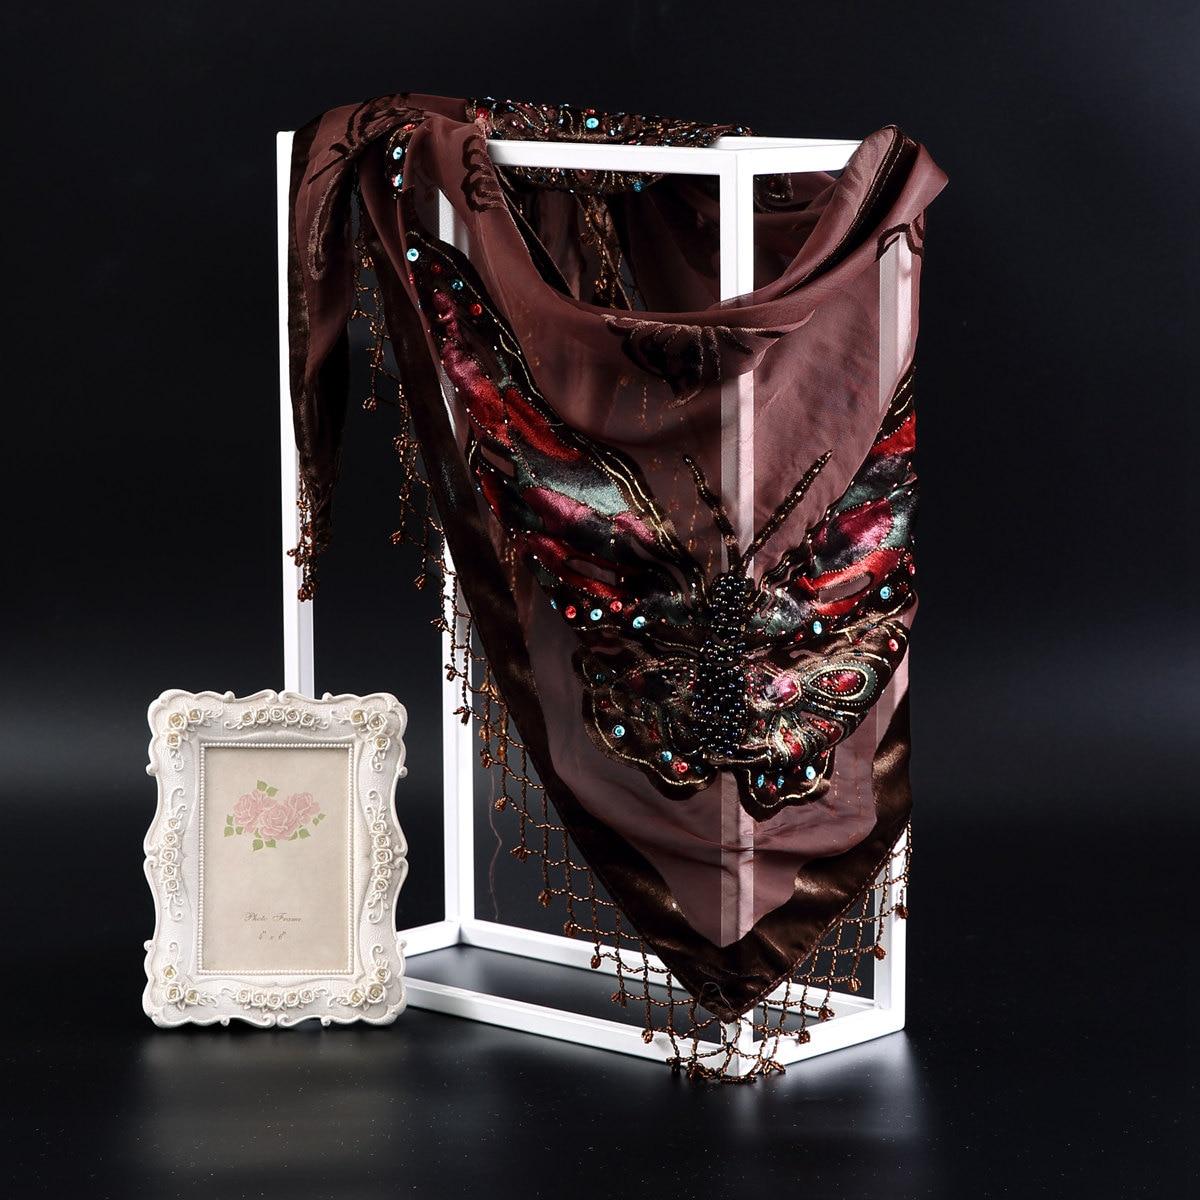 Handmade Beaded Cape Chal Scarves 70*150cm ELEGANT Chinese Female Scarf Wrap Shawls MantillaTriangle Pashmina Tassels Stole